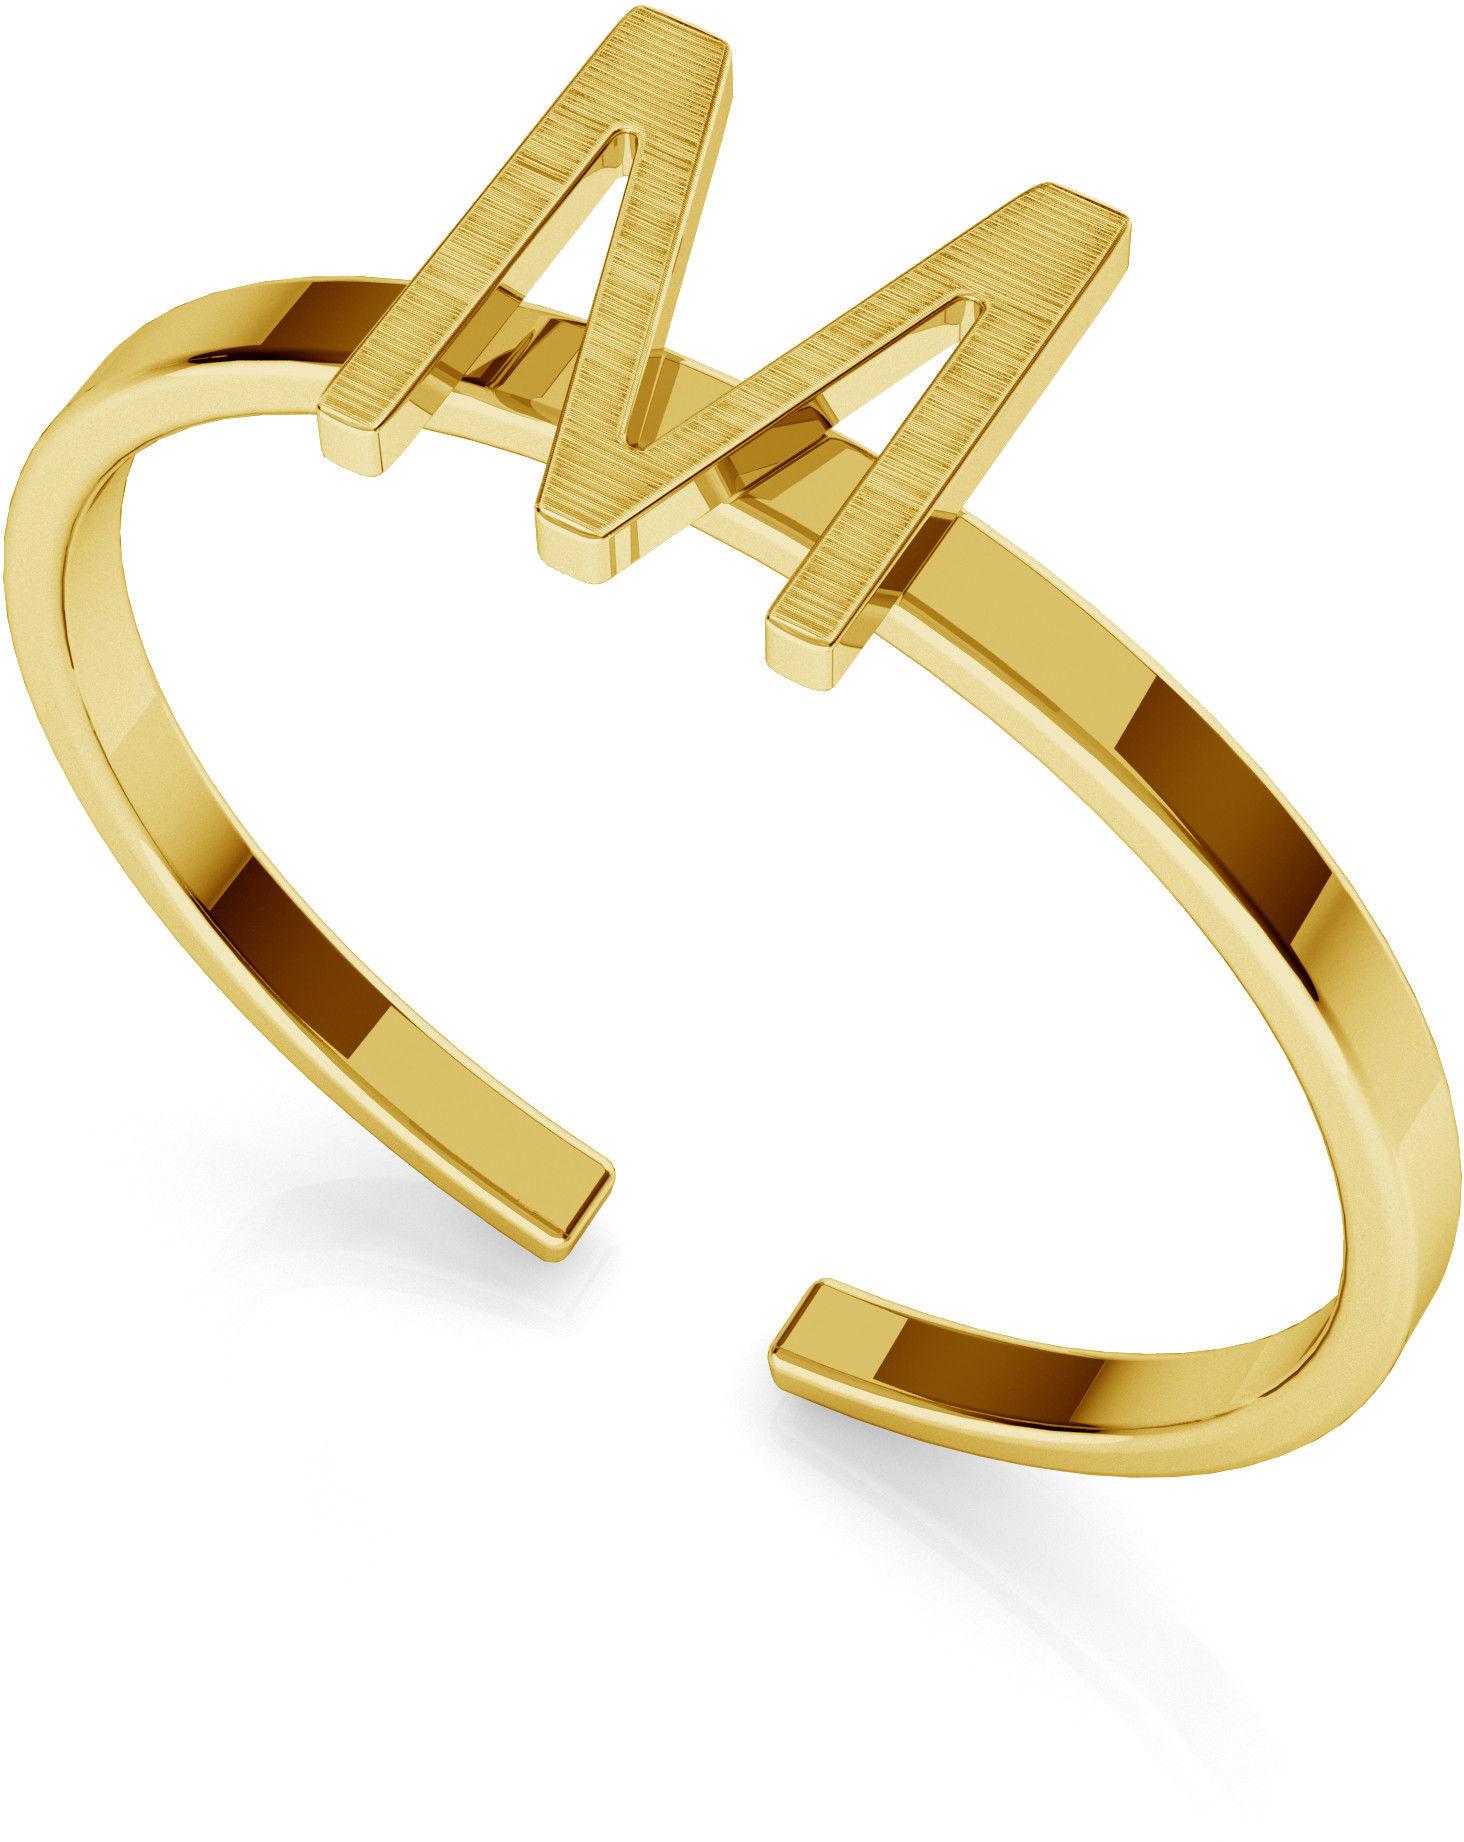 Srebrny pierścionek z literką My RING, srebro 925 : Litera - U, Srebro - kolor pokrycia - Pokrycie platyną